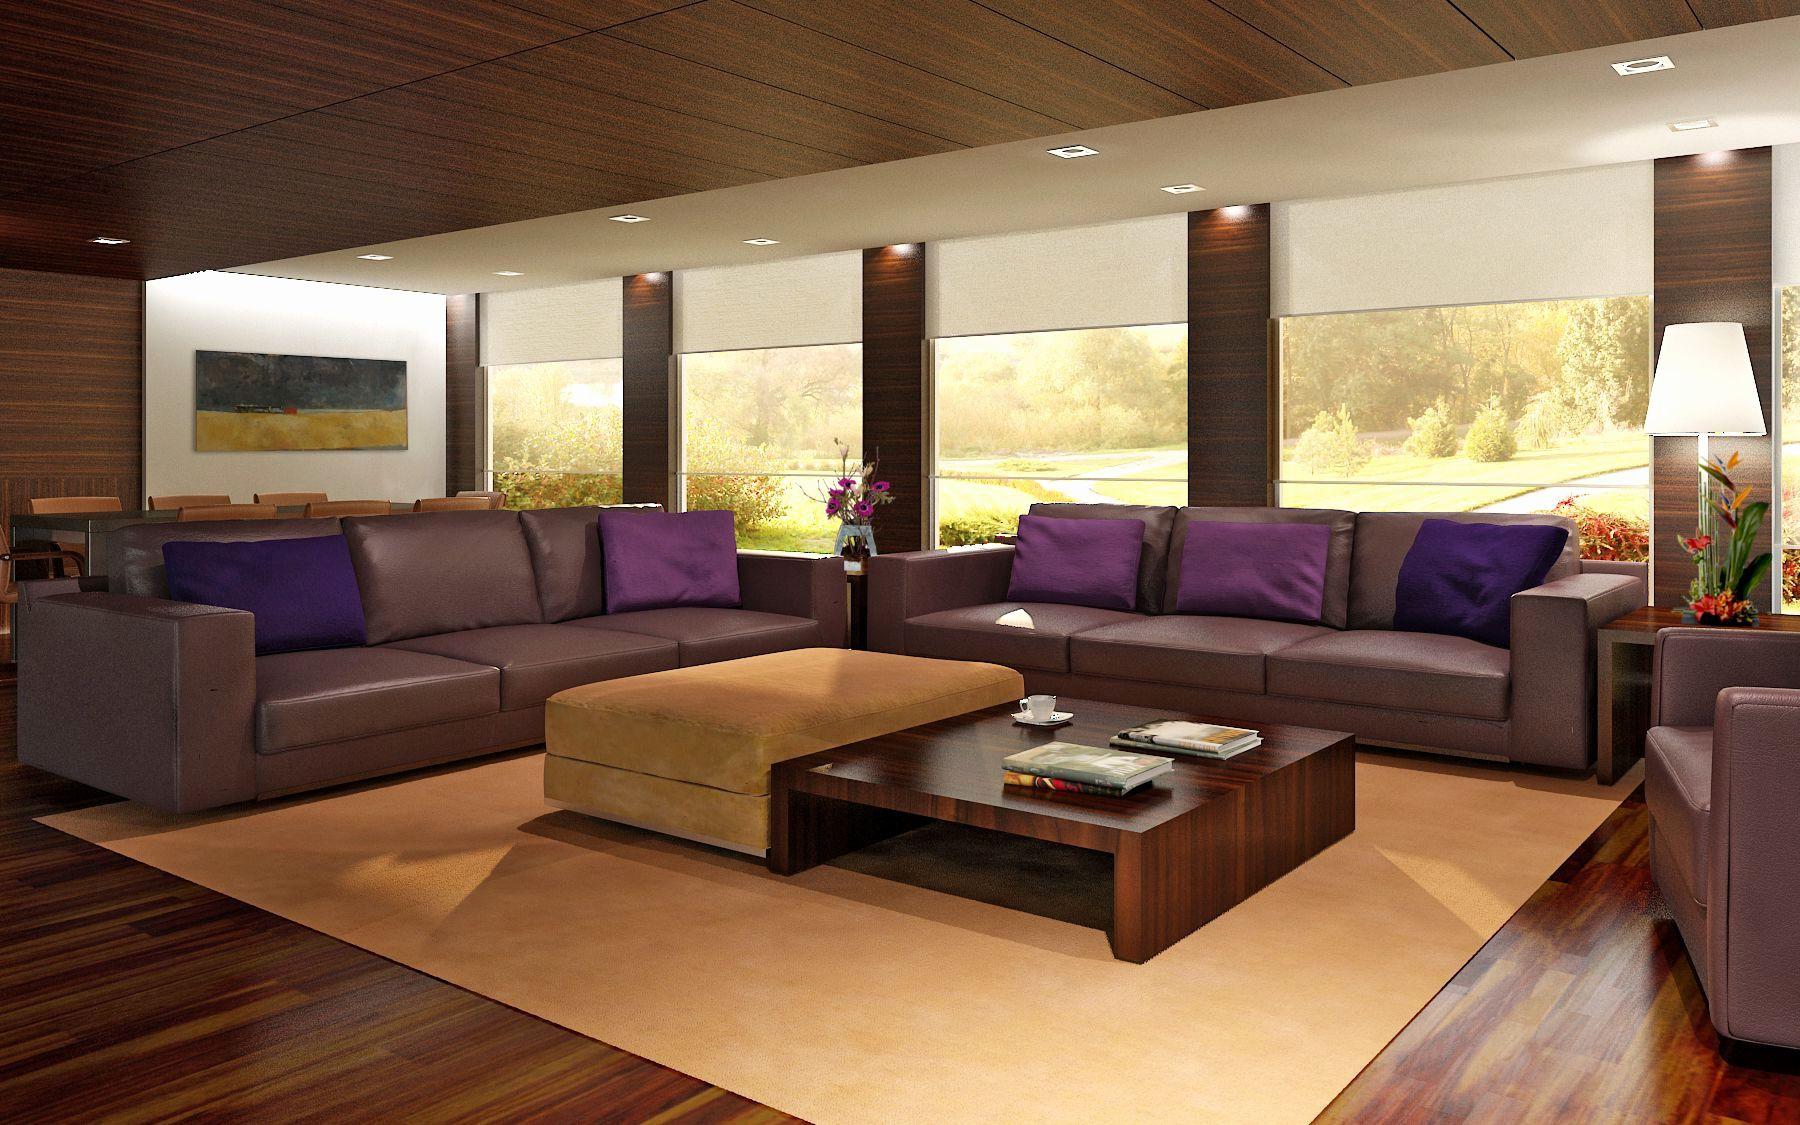 Charming New Purple Contemporary Sofa Shot Purple Contemporary Sofa Fresh 40 Images  Winsome Modern Purple Sofa Photographs